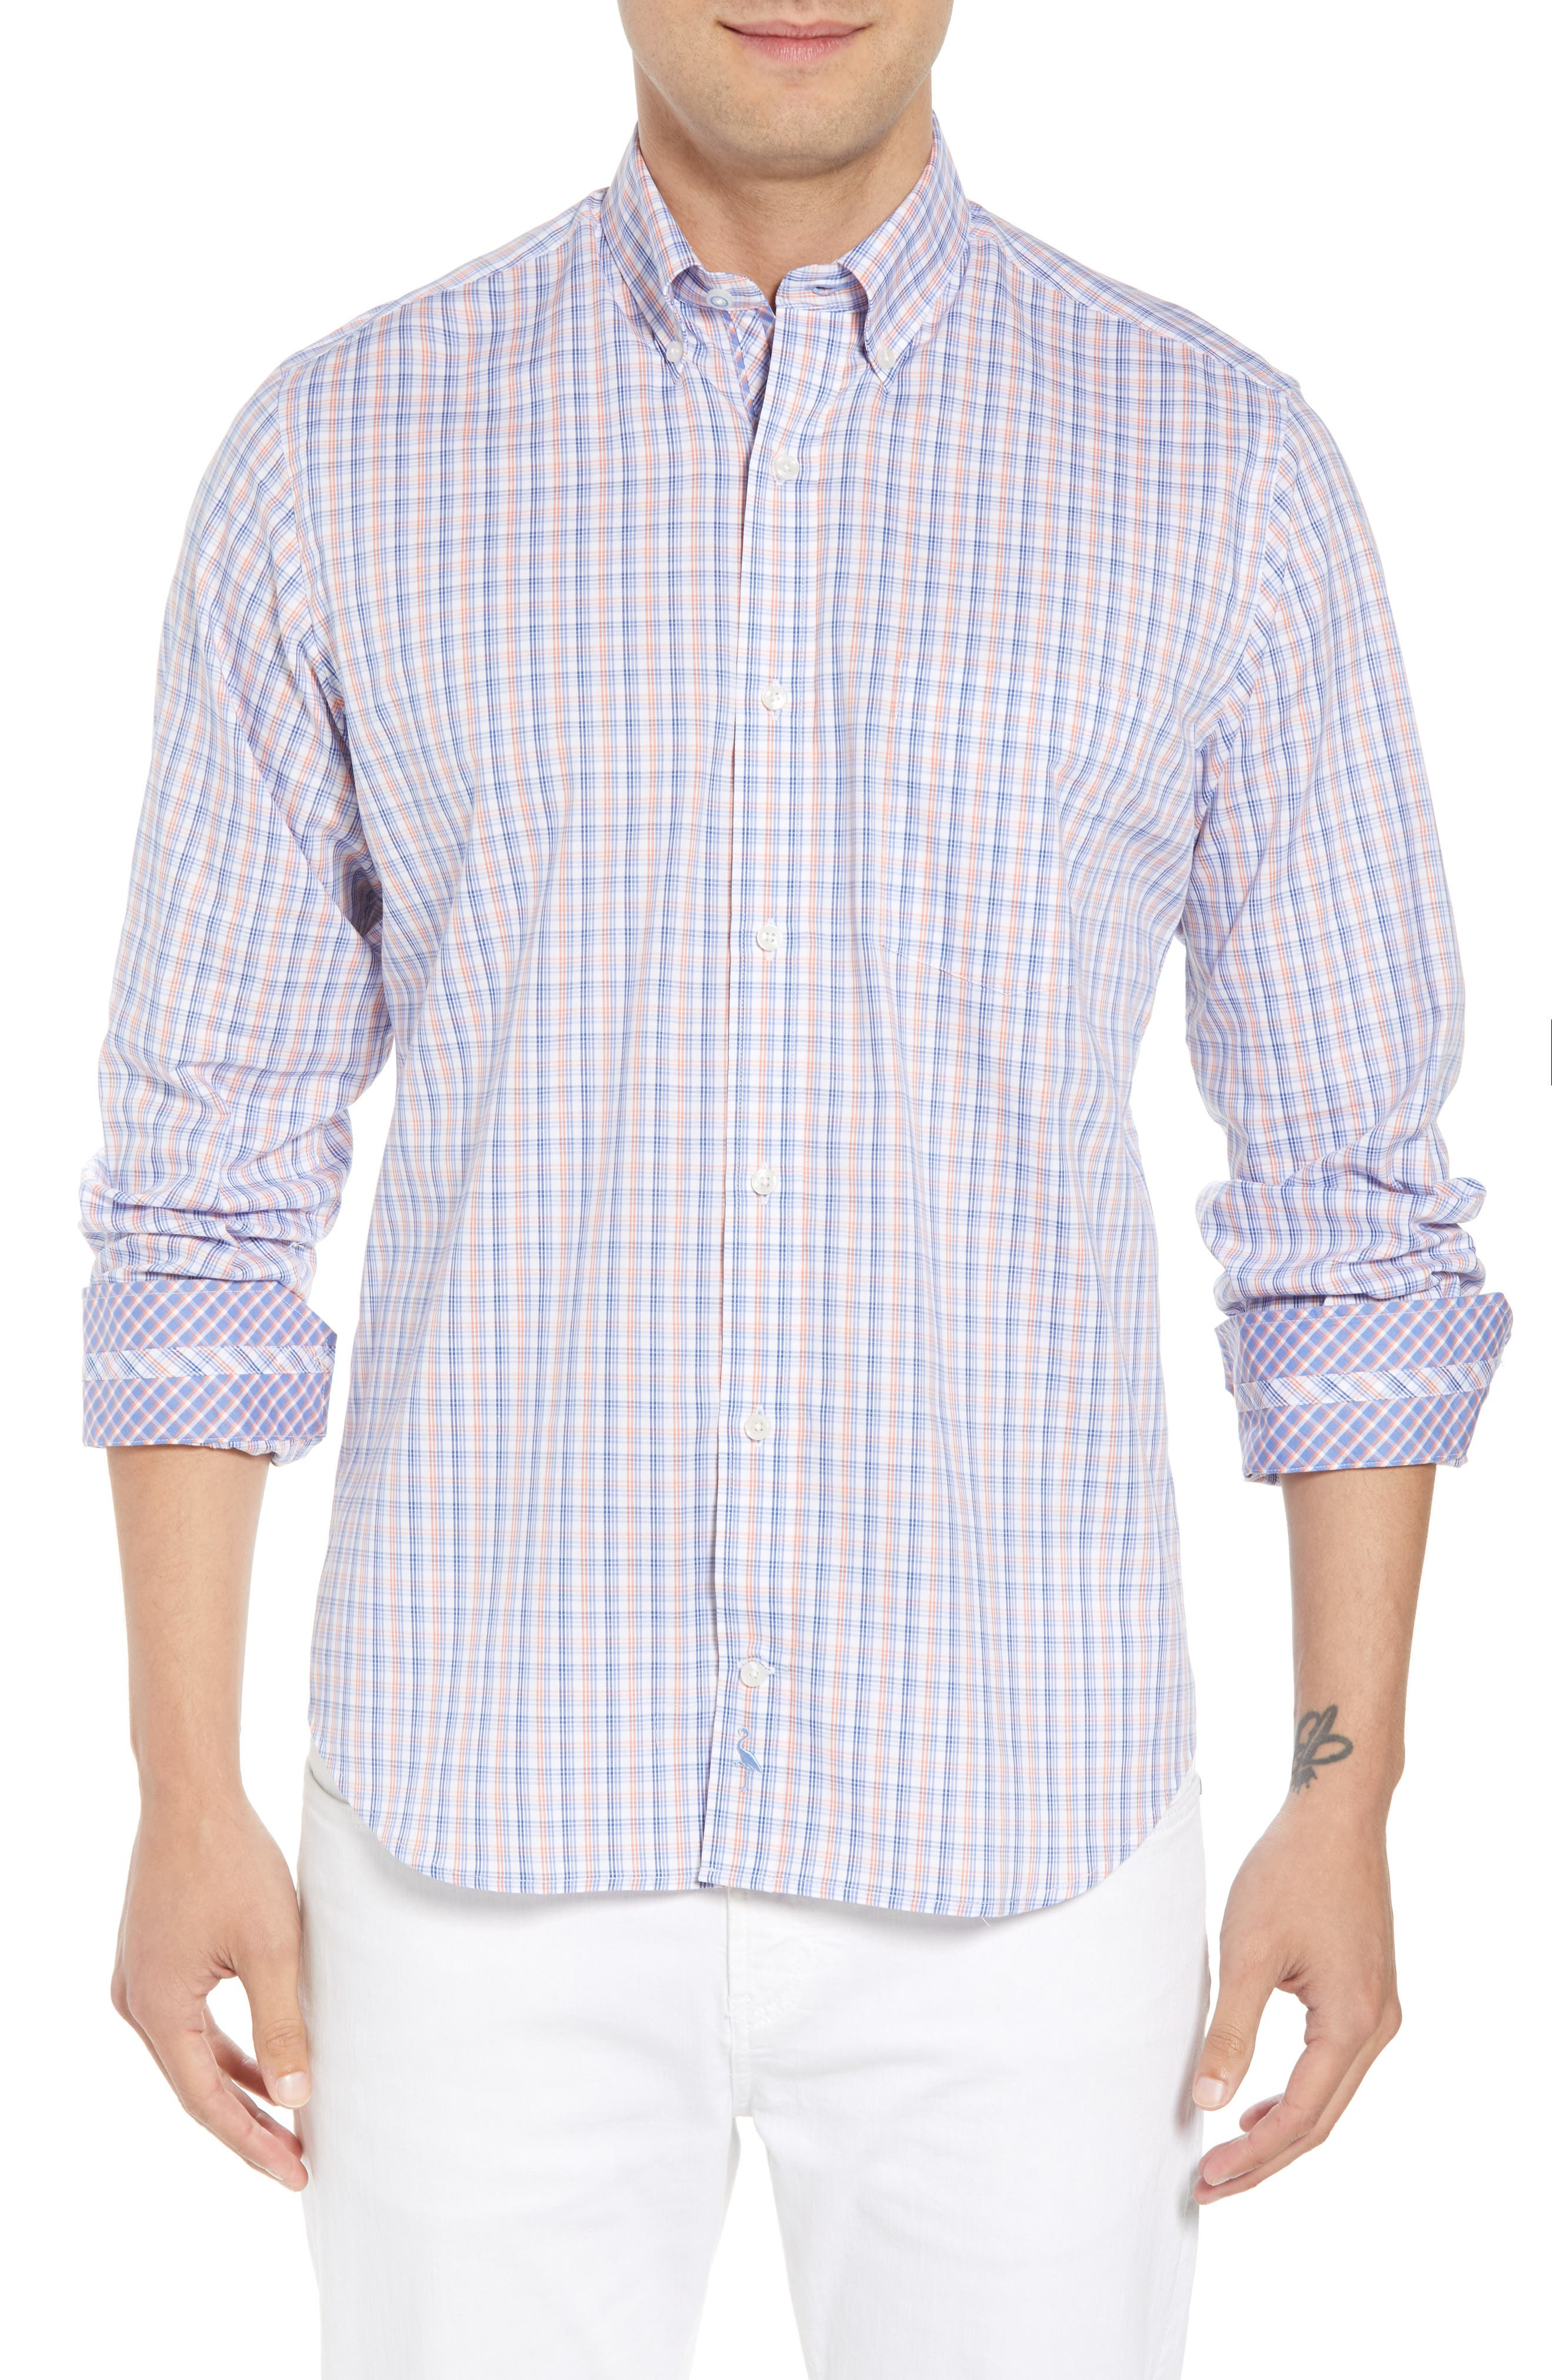 Adon Regular Fit Plaid Sport Shirt,                             Main thumbnail 1, color,                             Orange